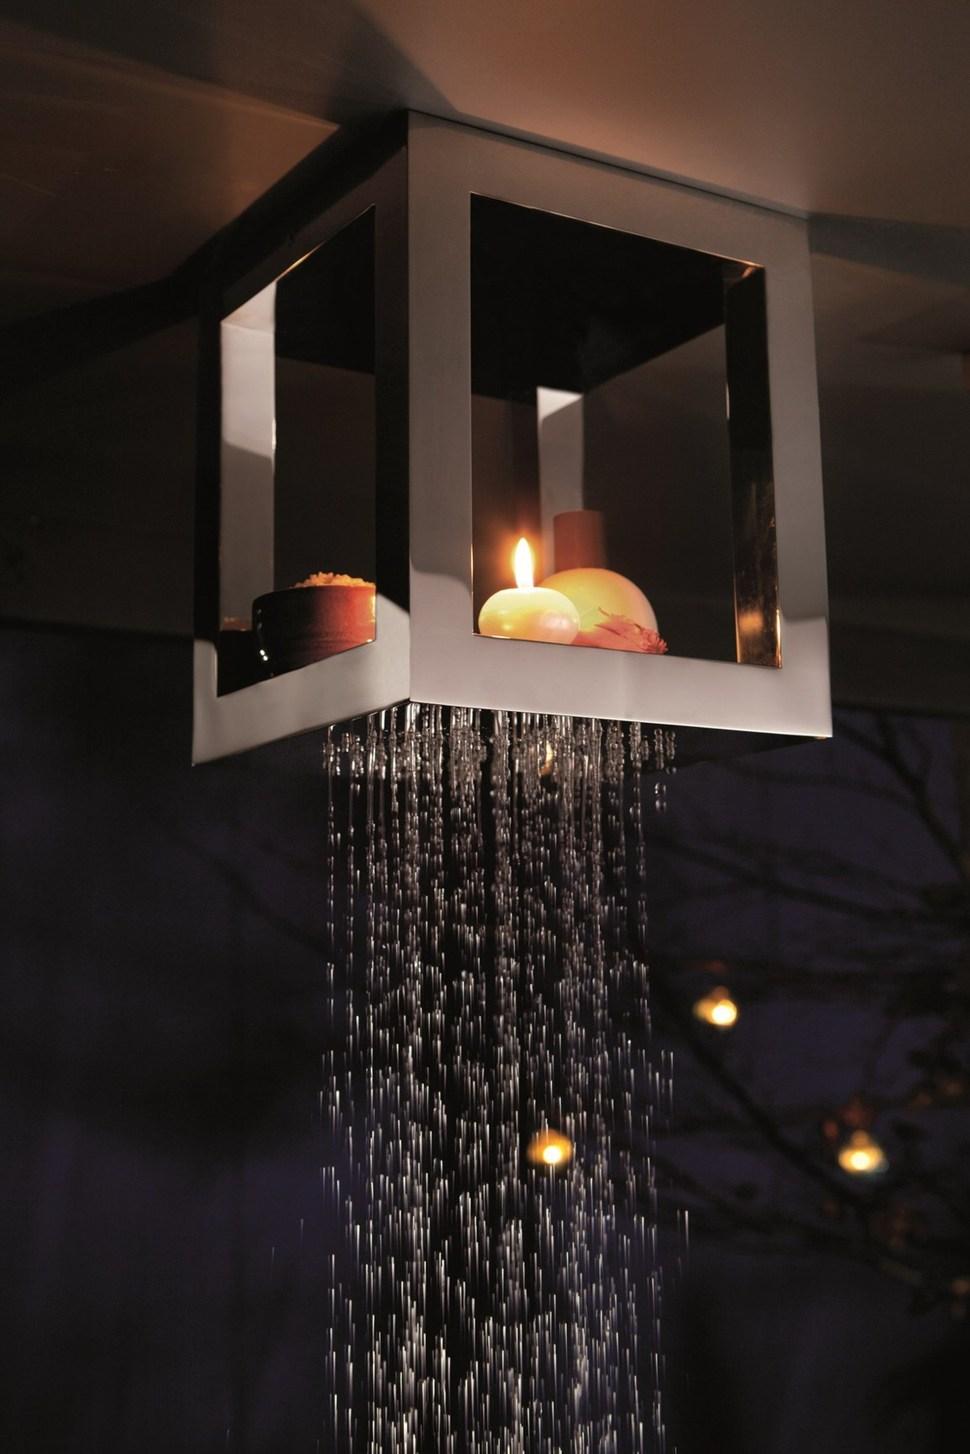 Overhead Shower Head Shelves - Bougies from Ritmonio by Peter Jamieson